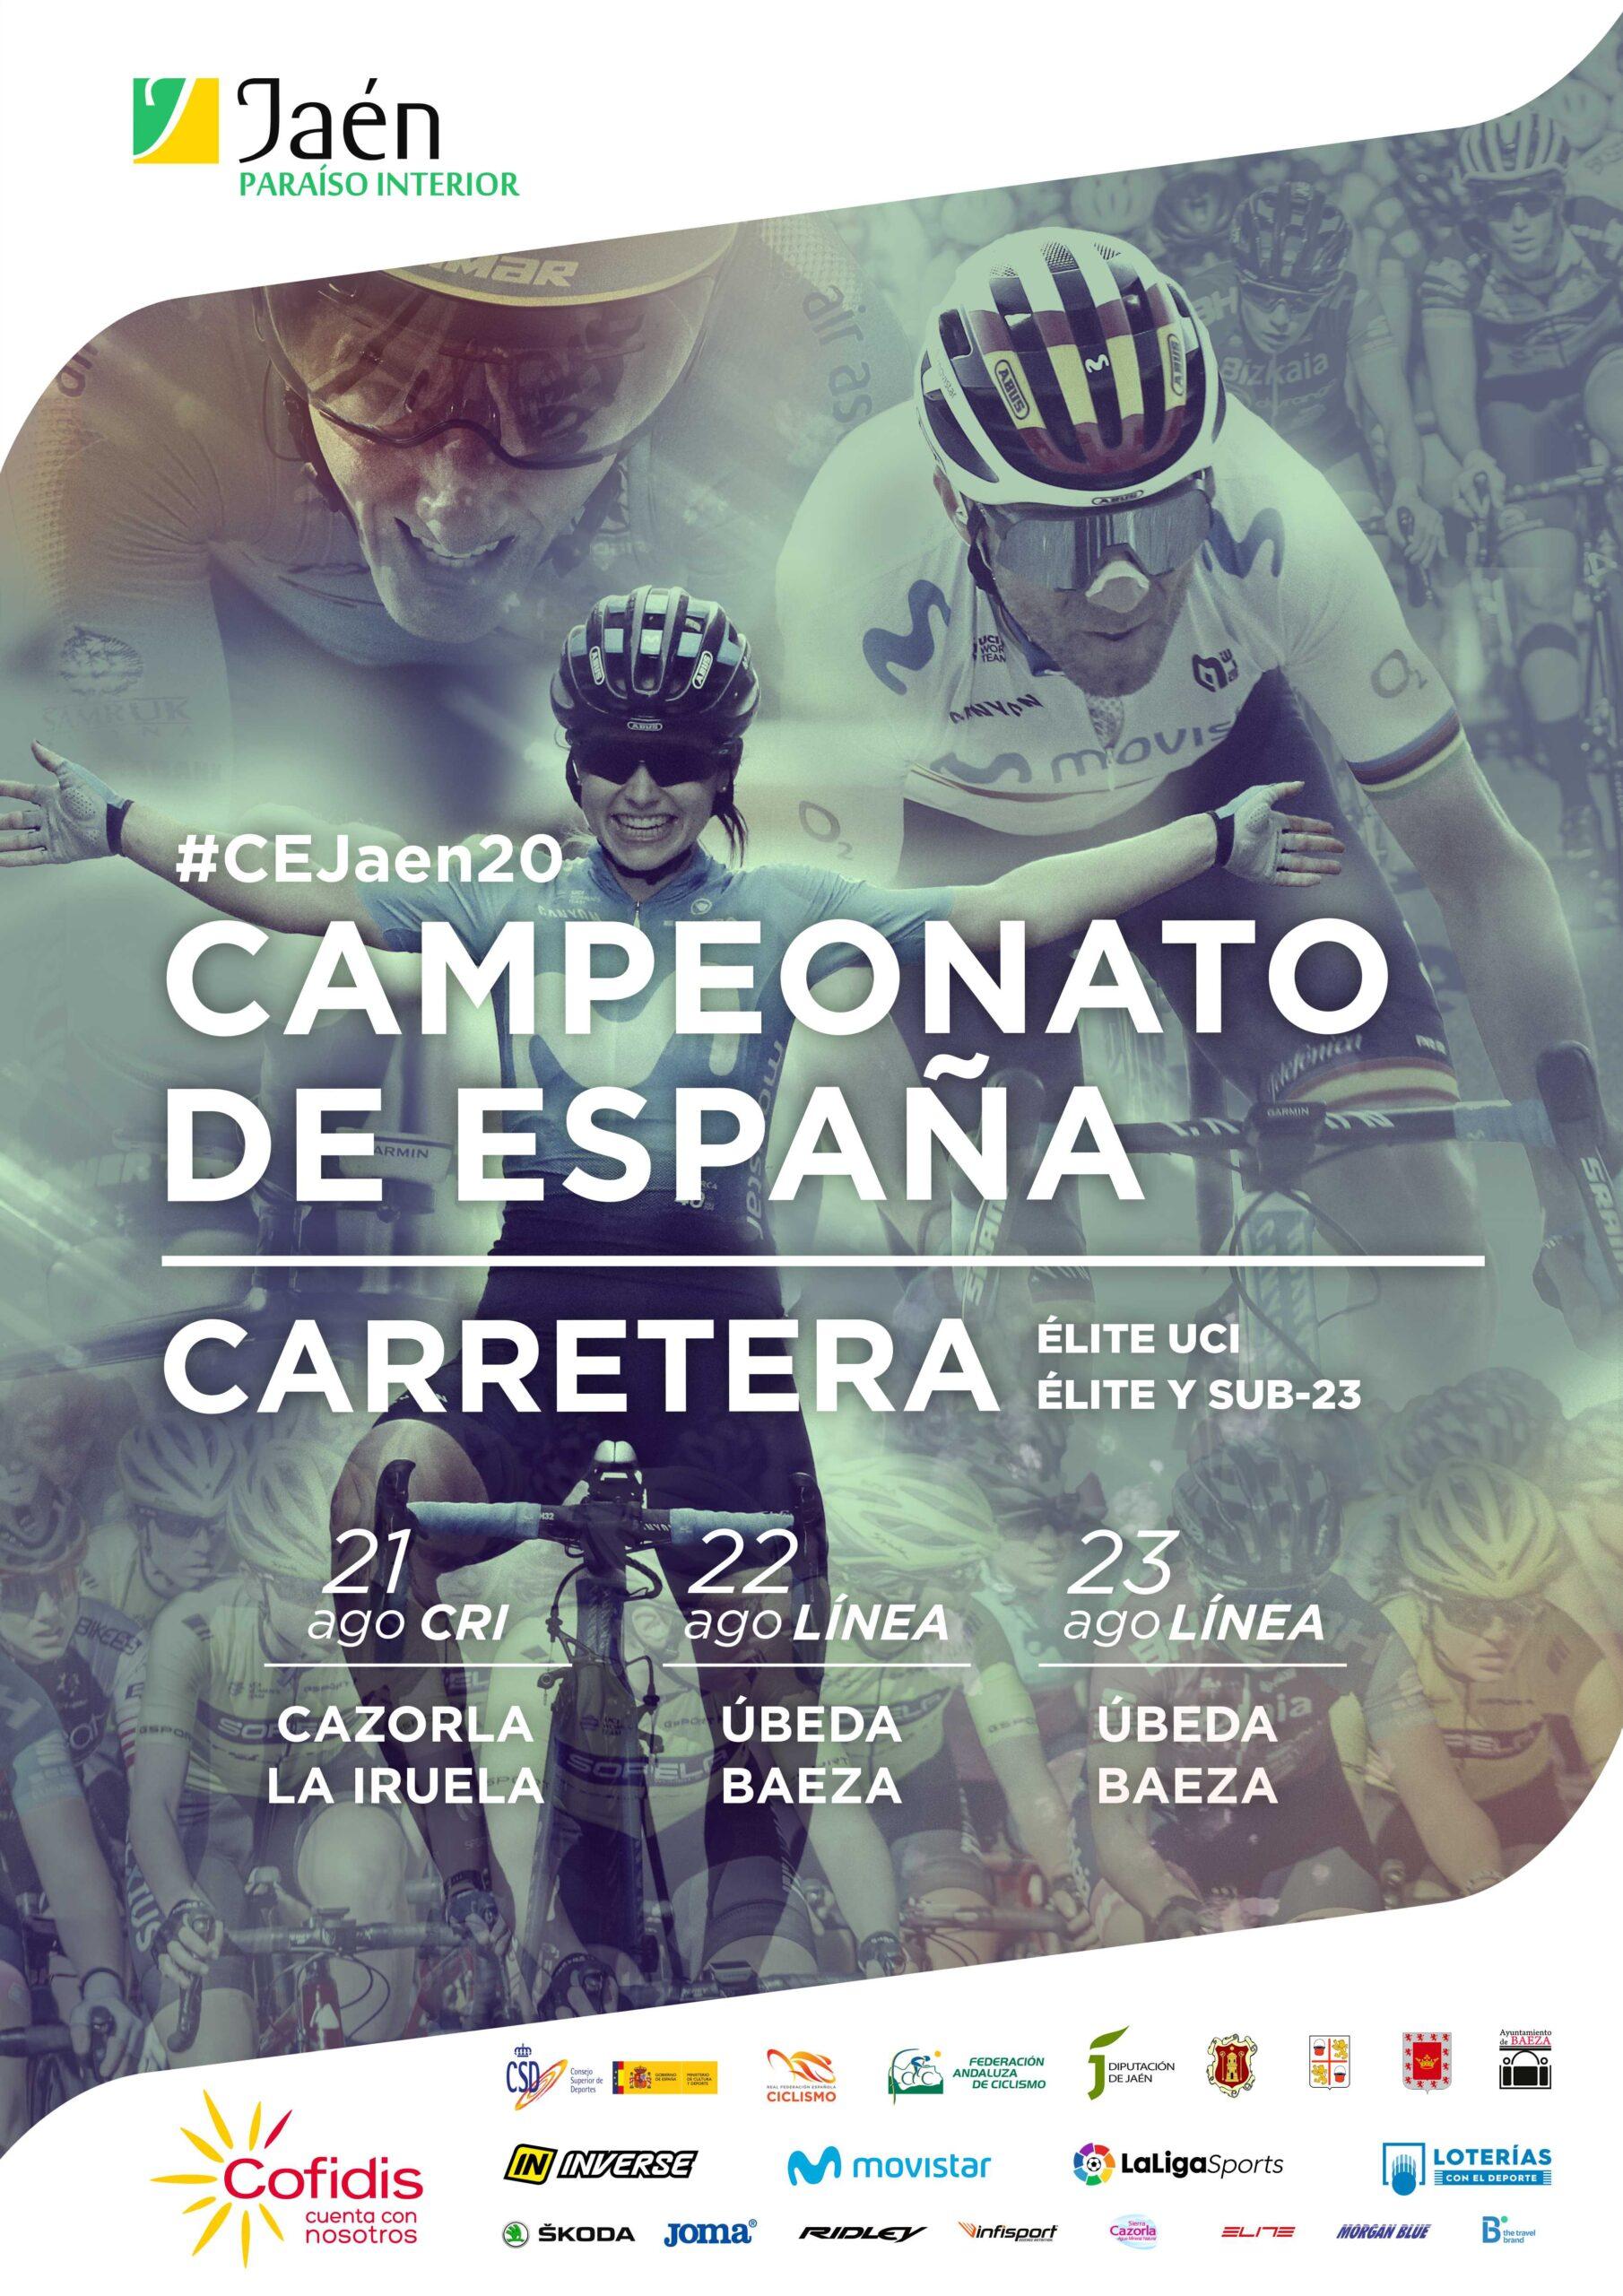 Campeonatos de España de Ciclismo 2020